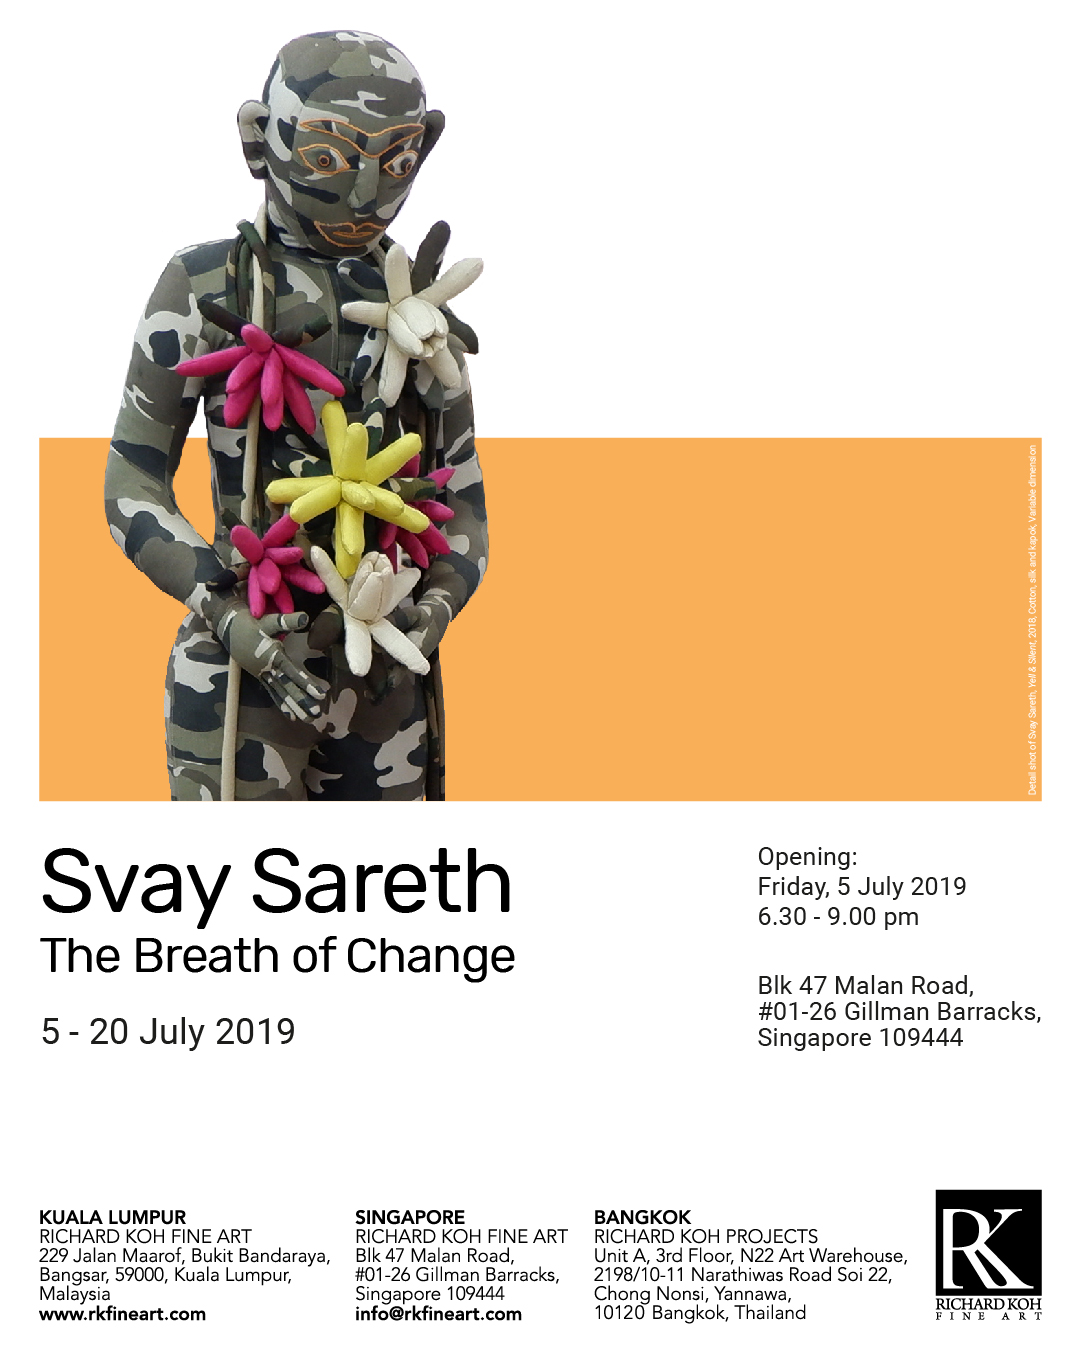 Svay Sareth – The Breath of Change